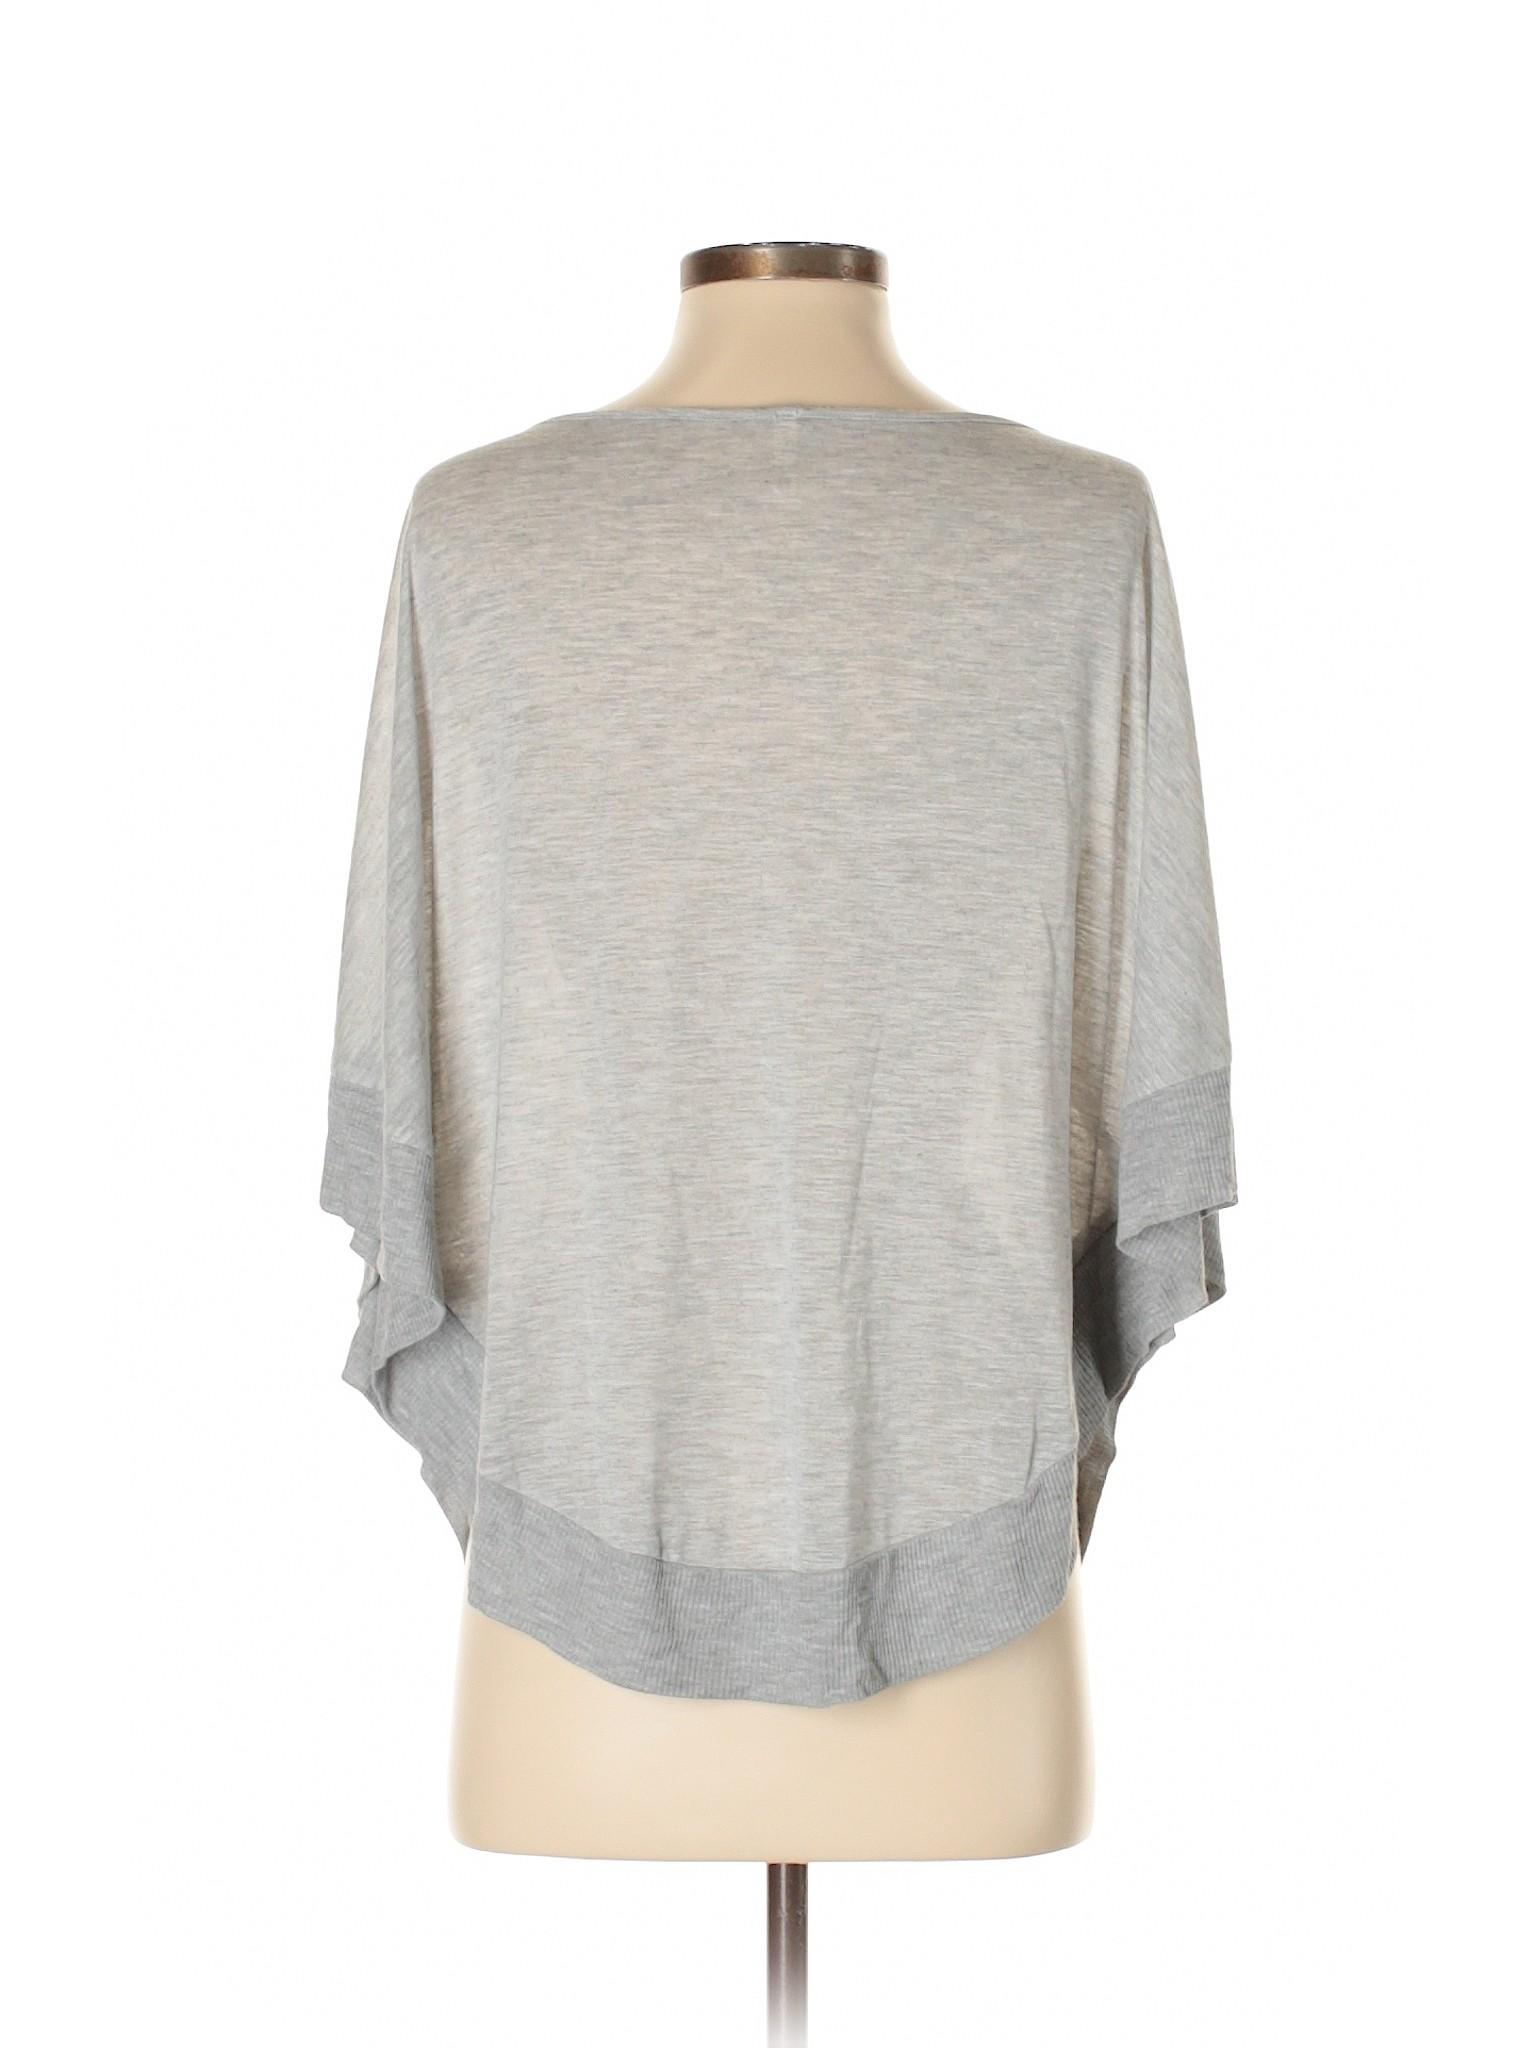 Sweater Boutique Boutique Lanston Lanston Pullover Pullover vFpq8